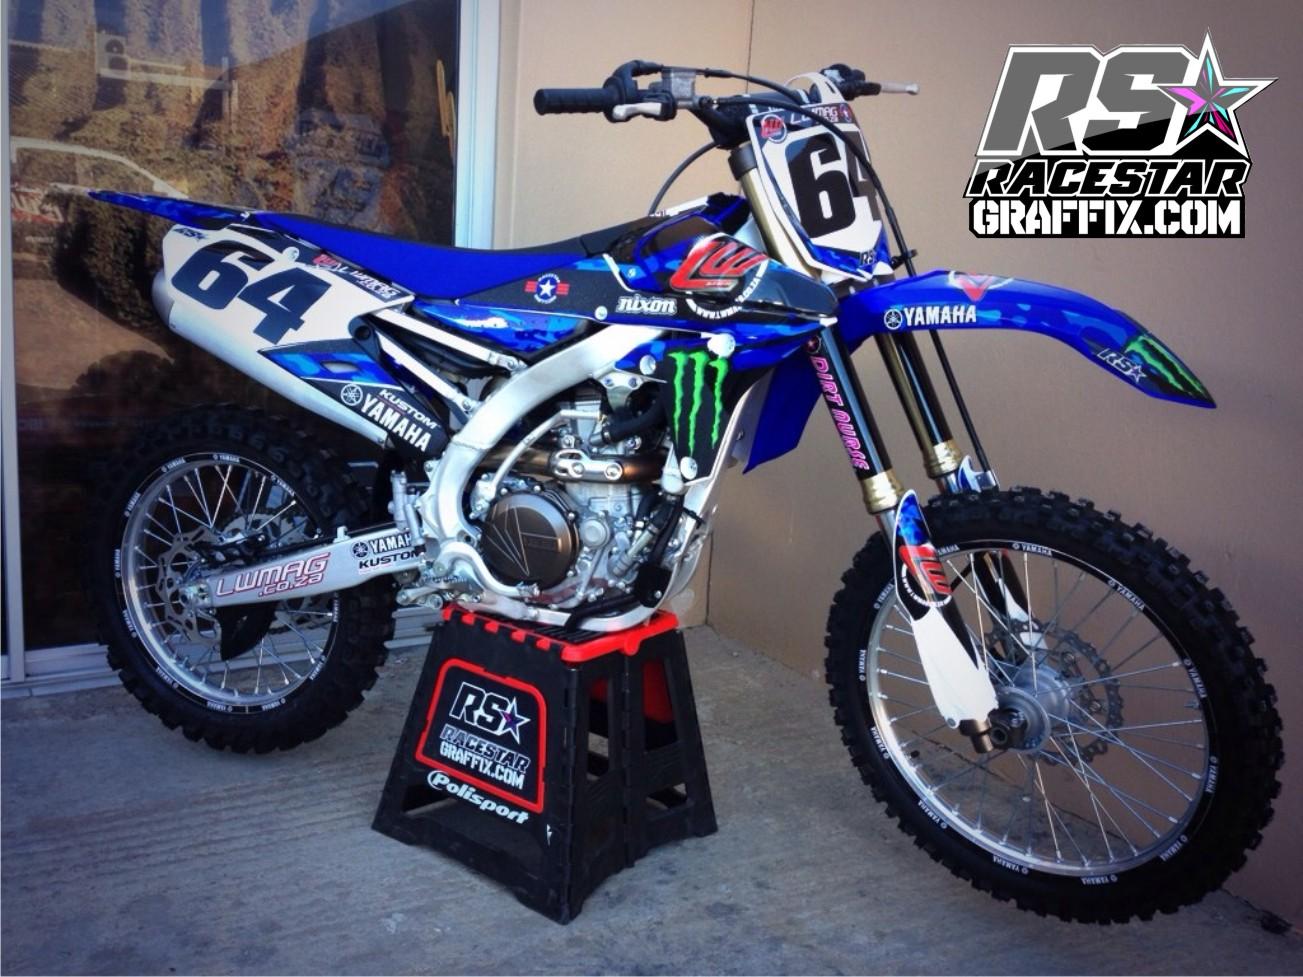 Get That Factory Look With Racestar Graffix Motocross